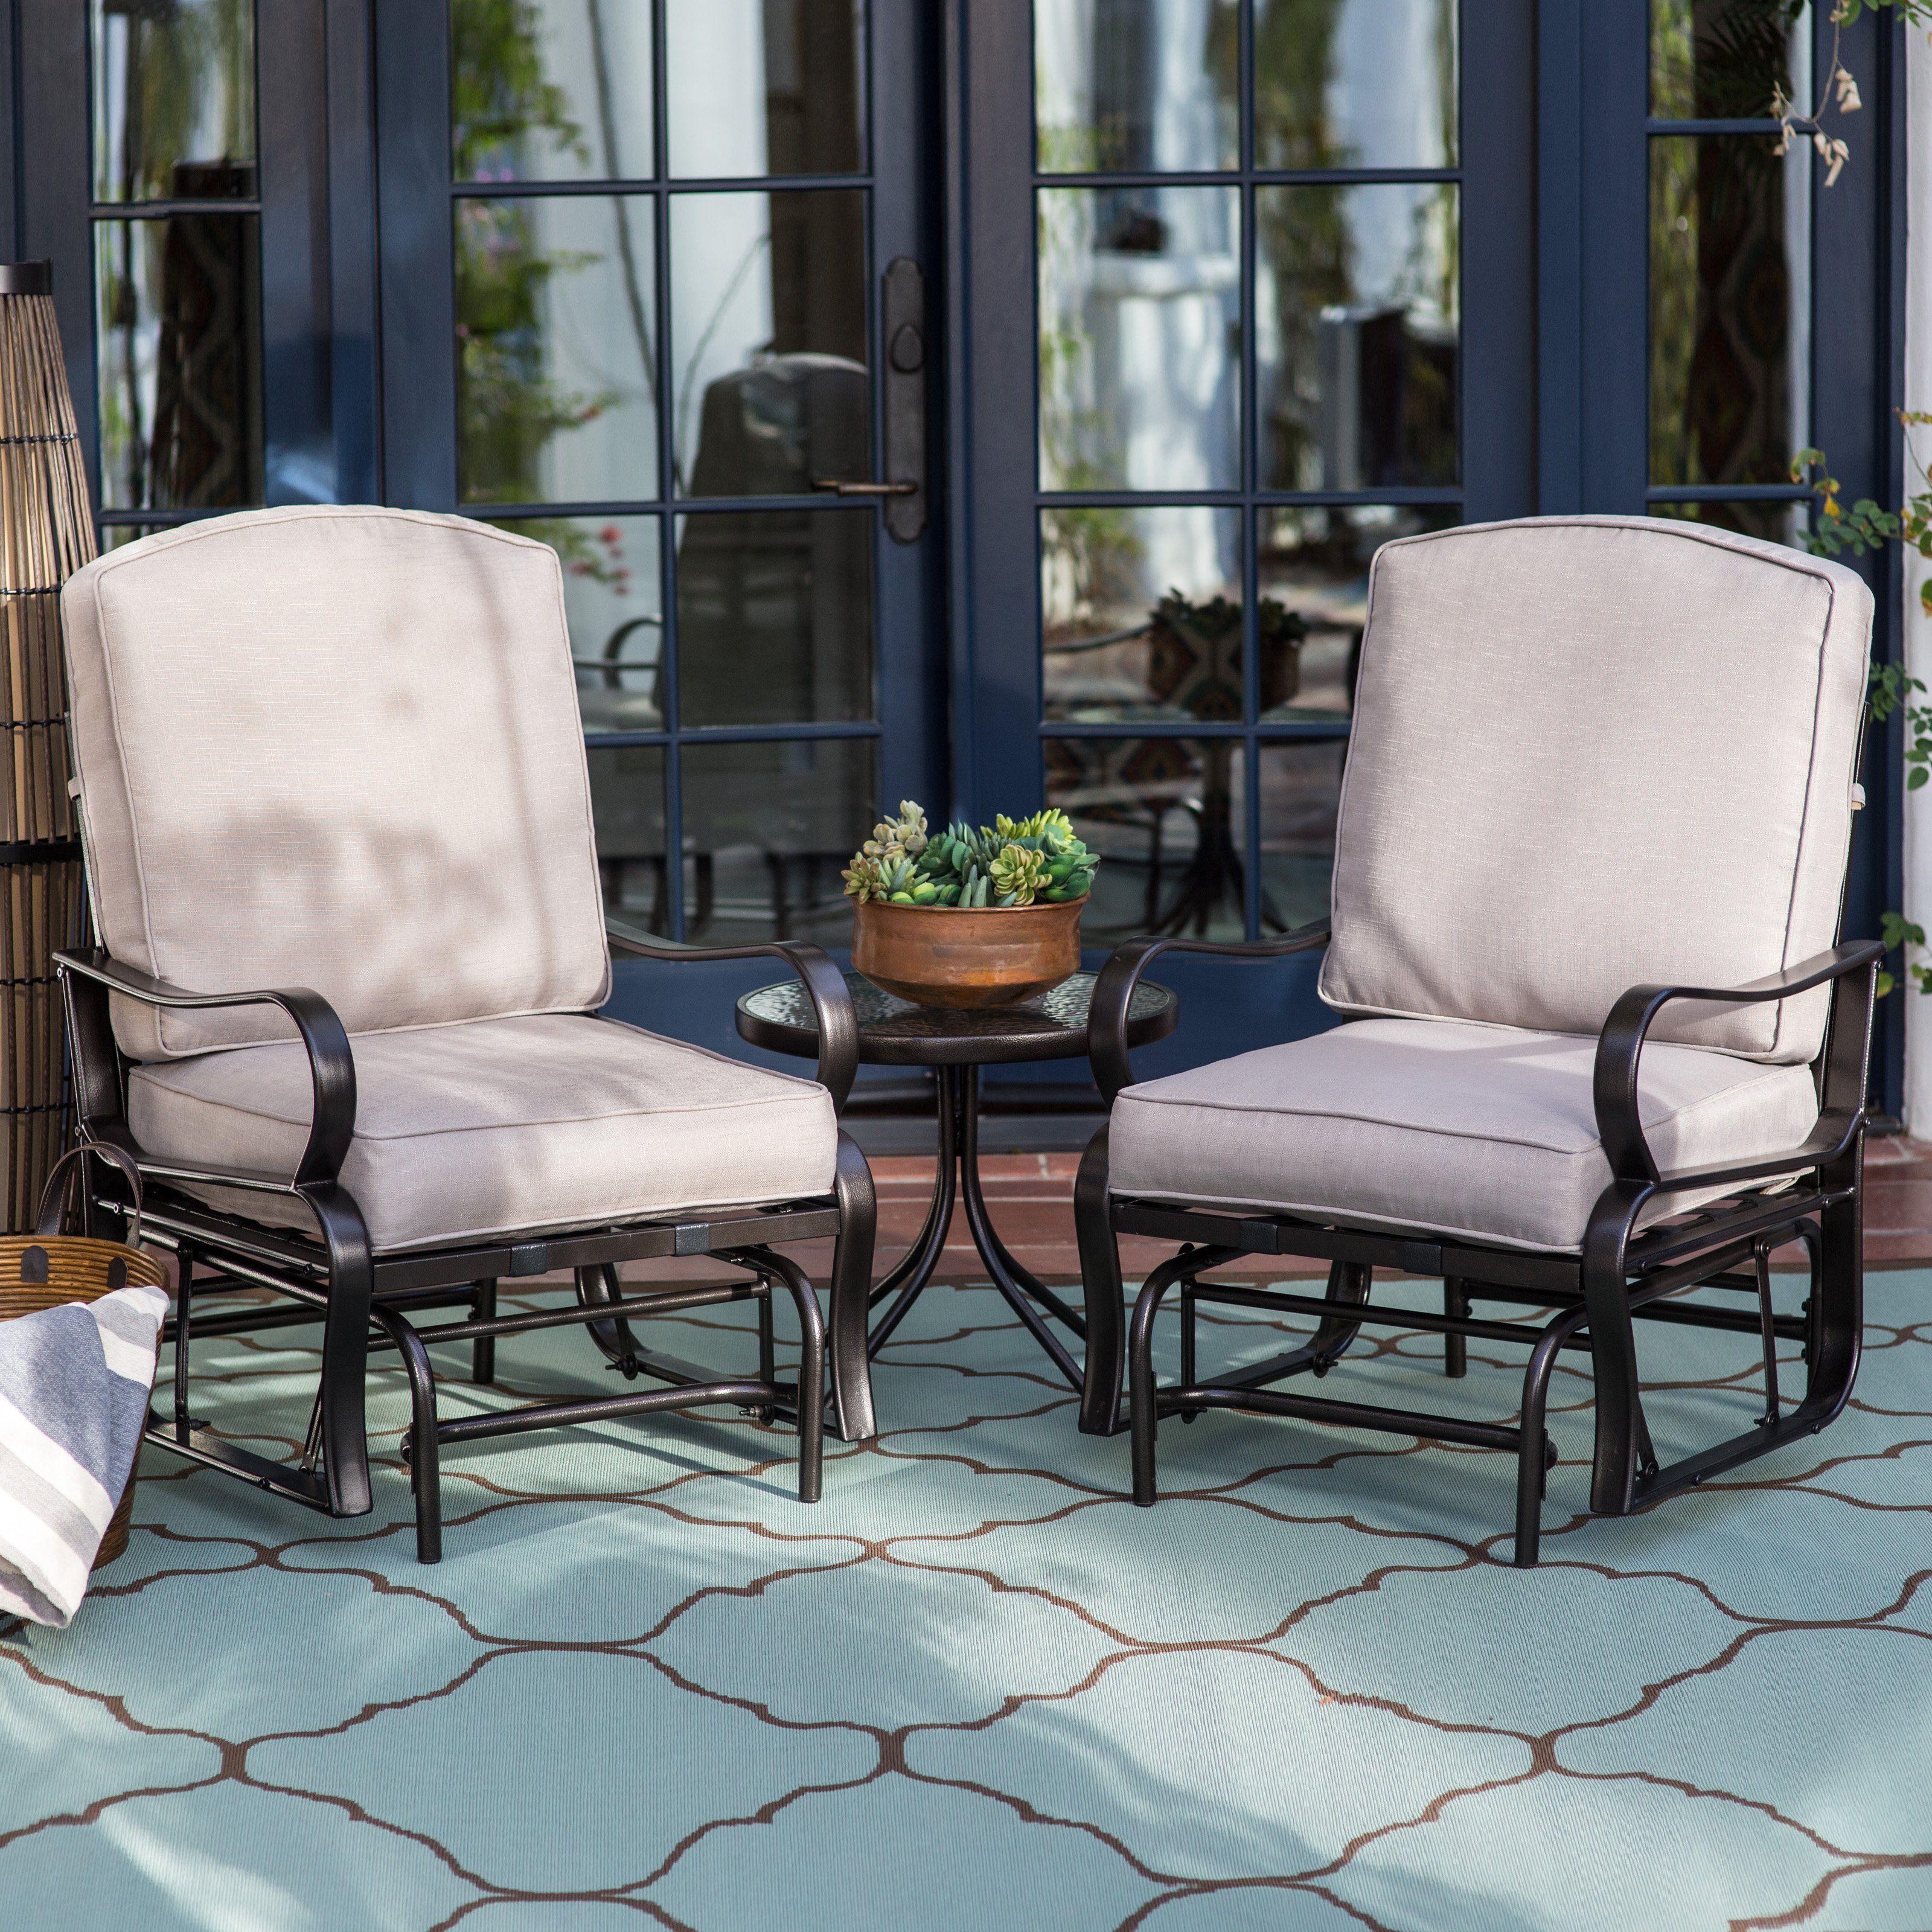 Tremendous Outdoor Belham Living Cameron Single Glider Set With Free Machost Co Dining Chair Design Ideas Machostcouk